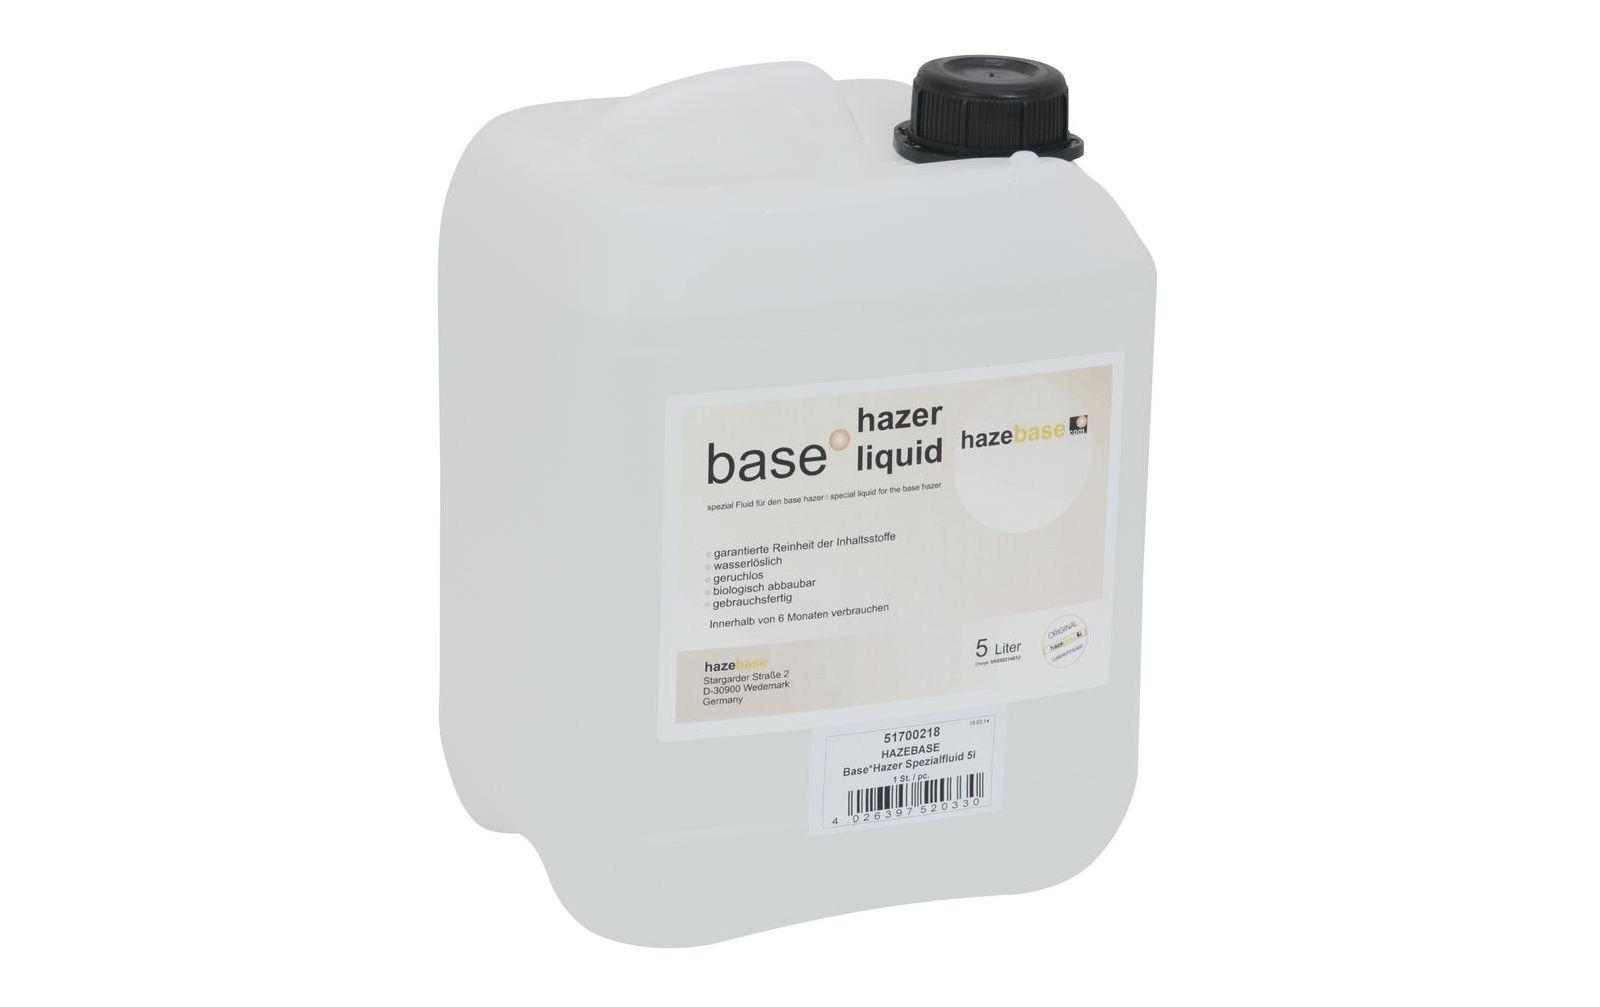 hazebase-base-hazer-spezialfluid-25l-kanister